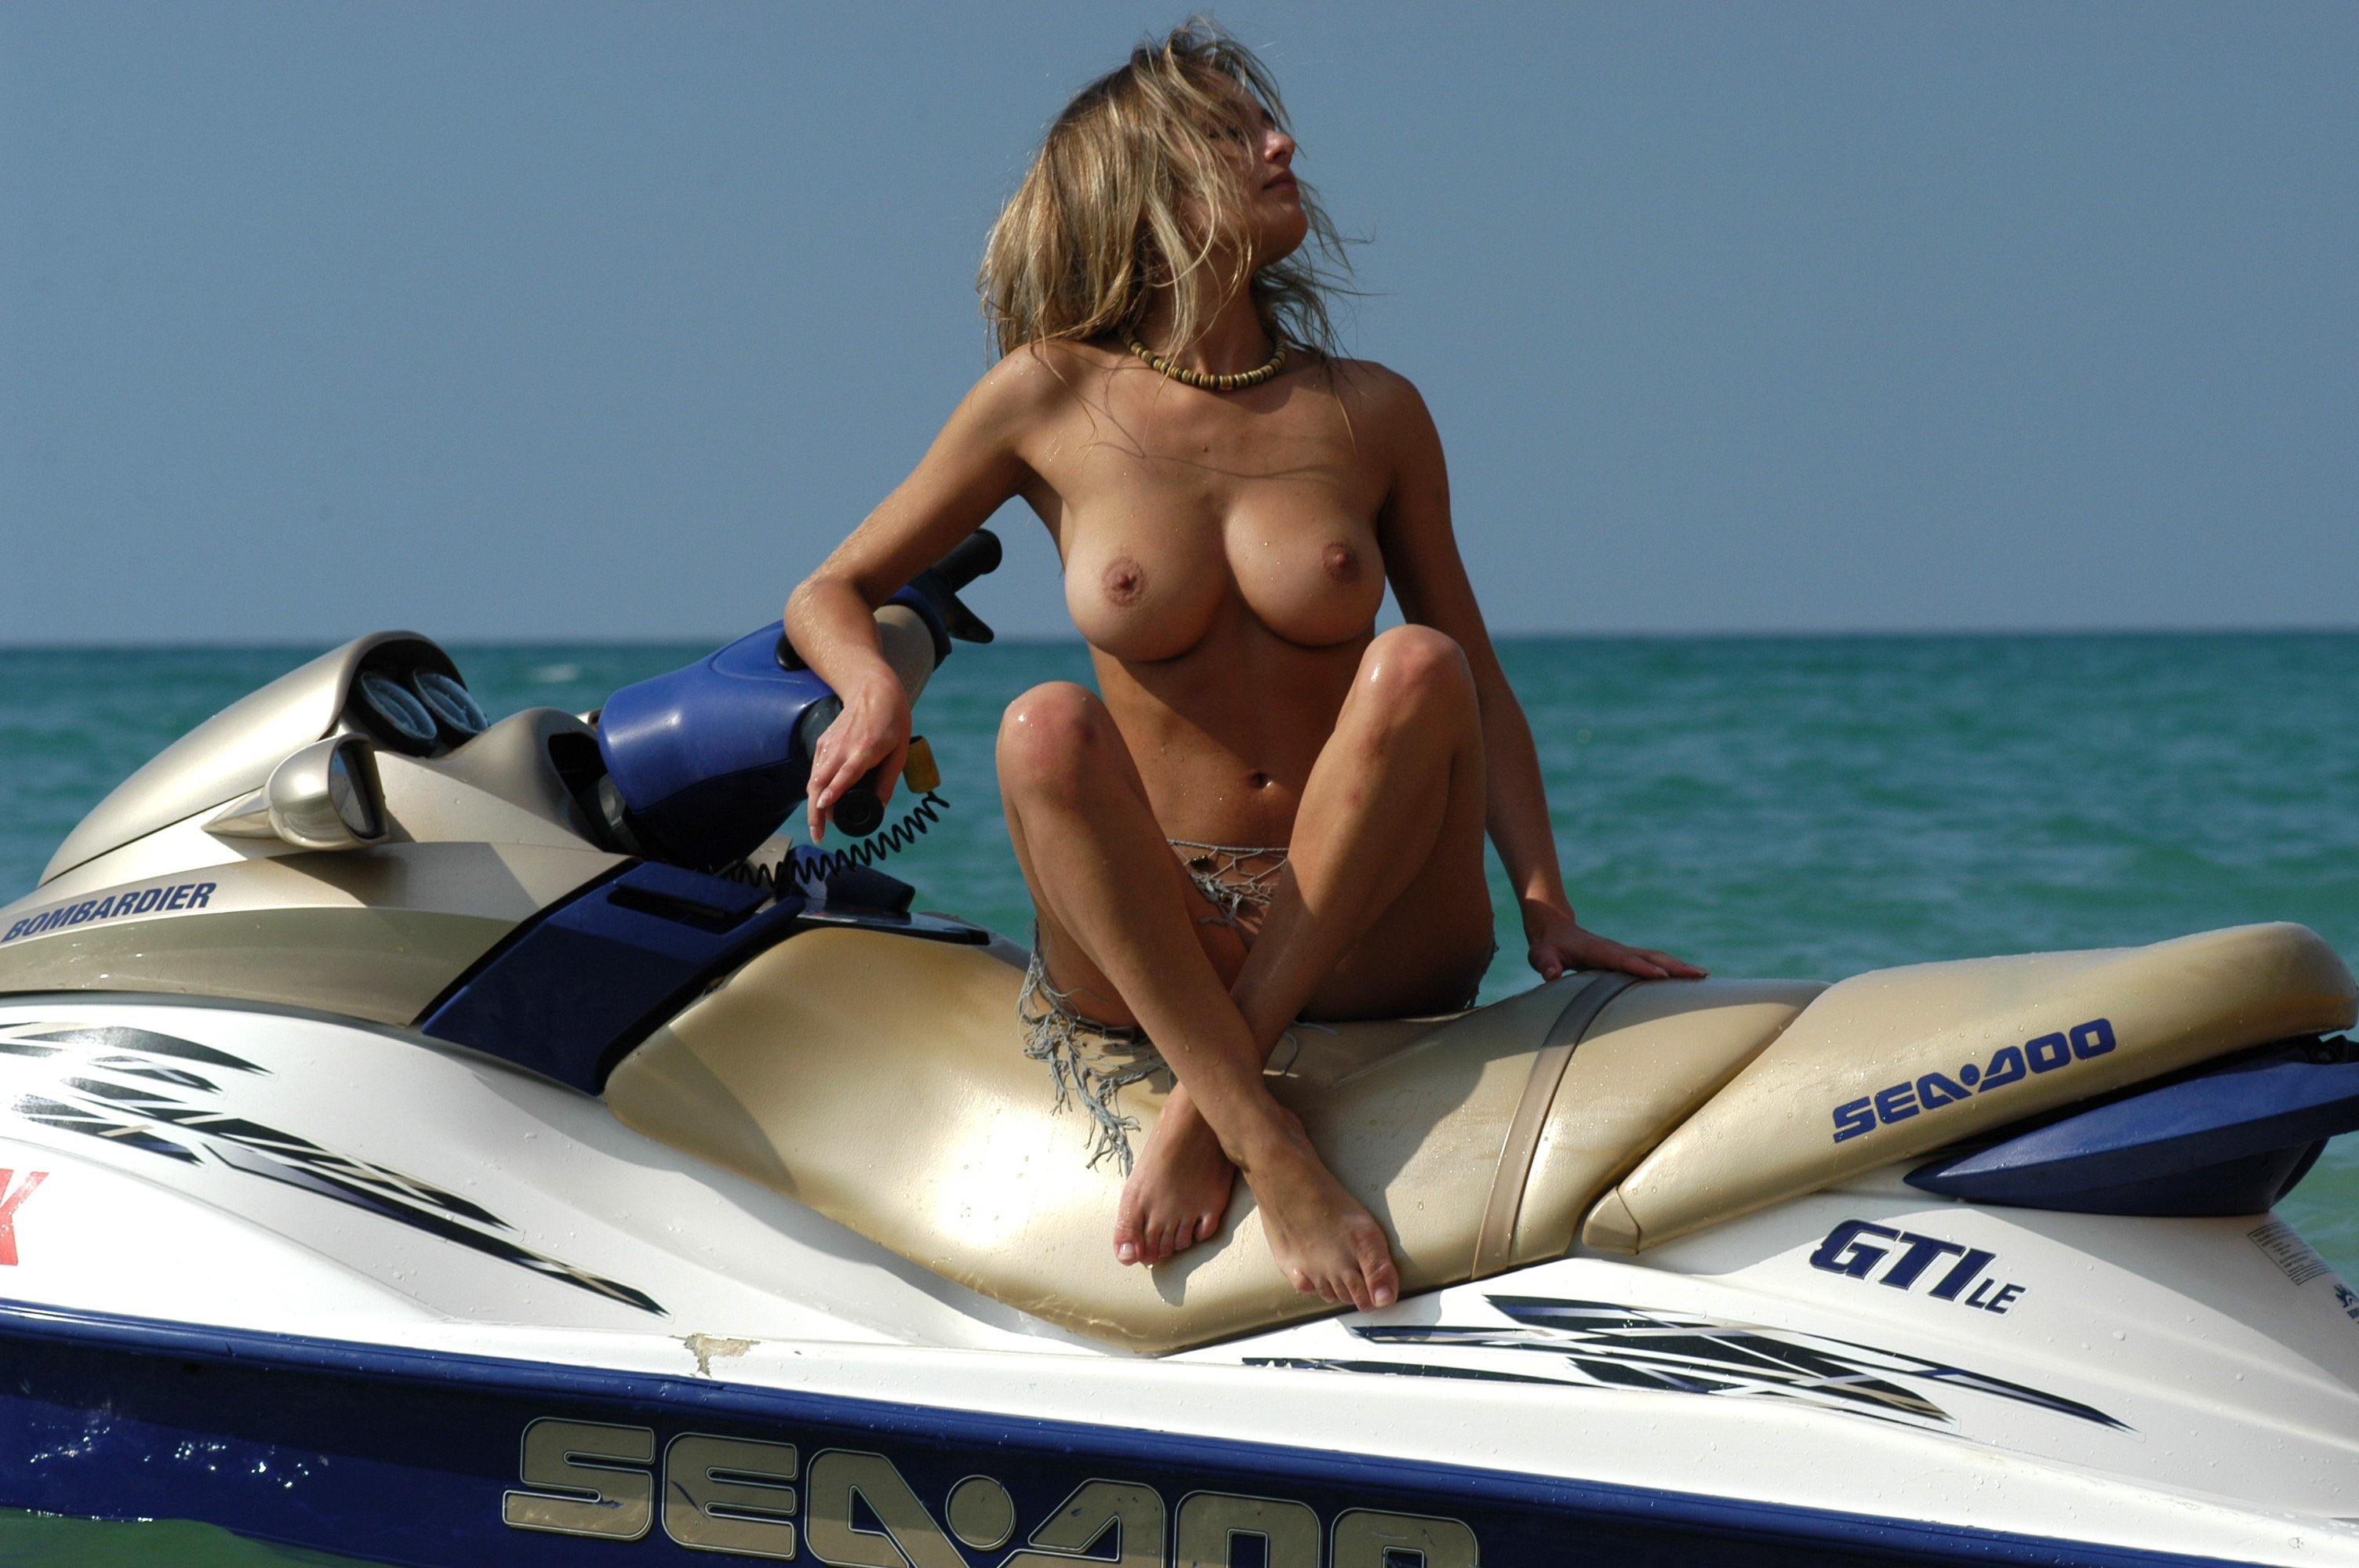 Naked on jet ski